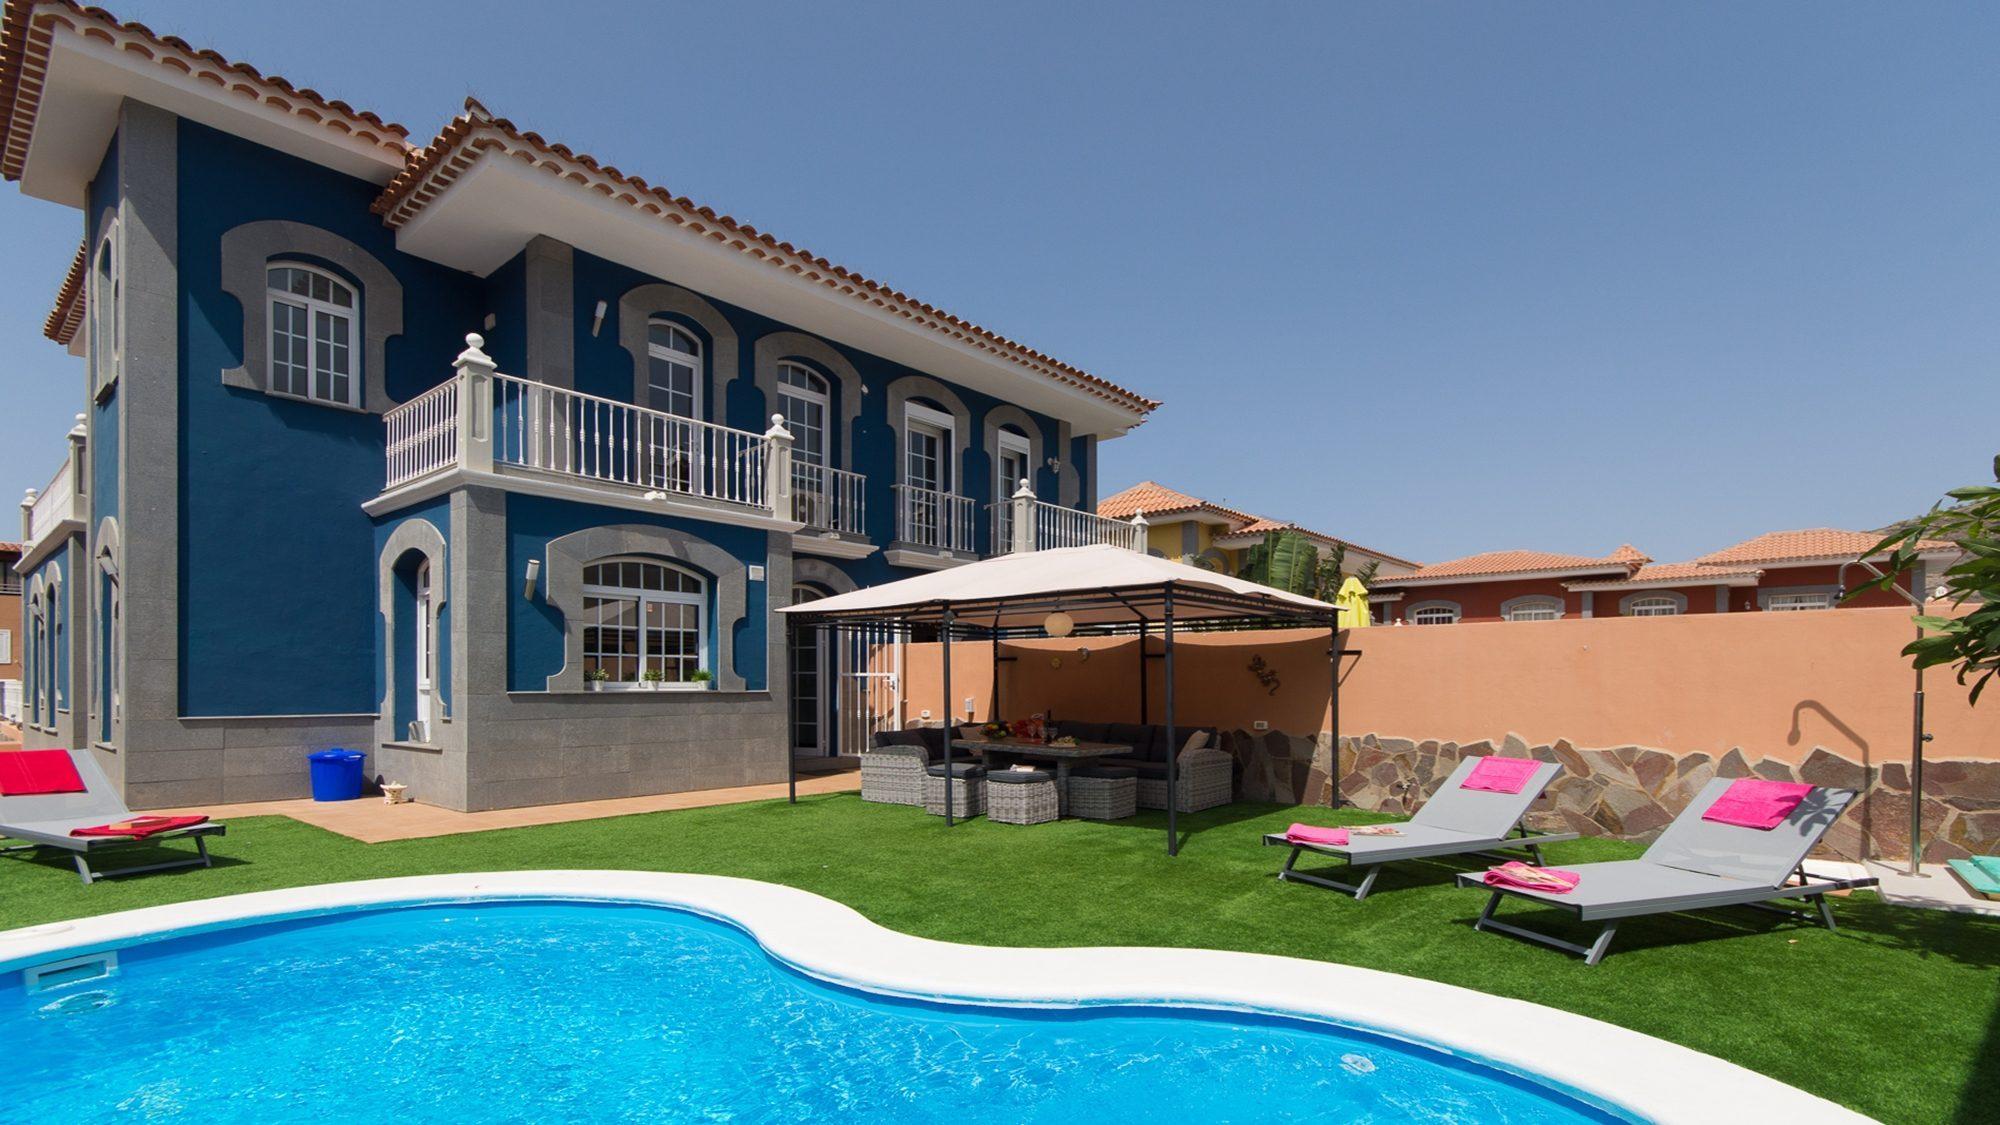 3 Bedroom Villas to Rent in Tenerife | Private Heated Pool ...